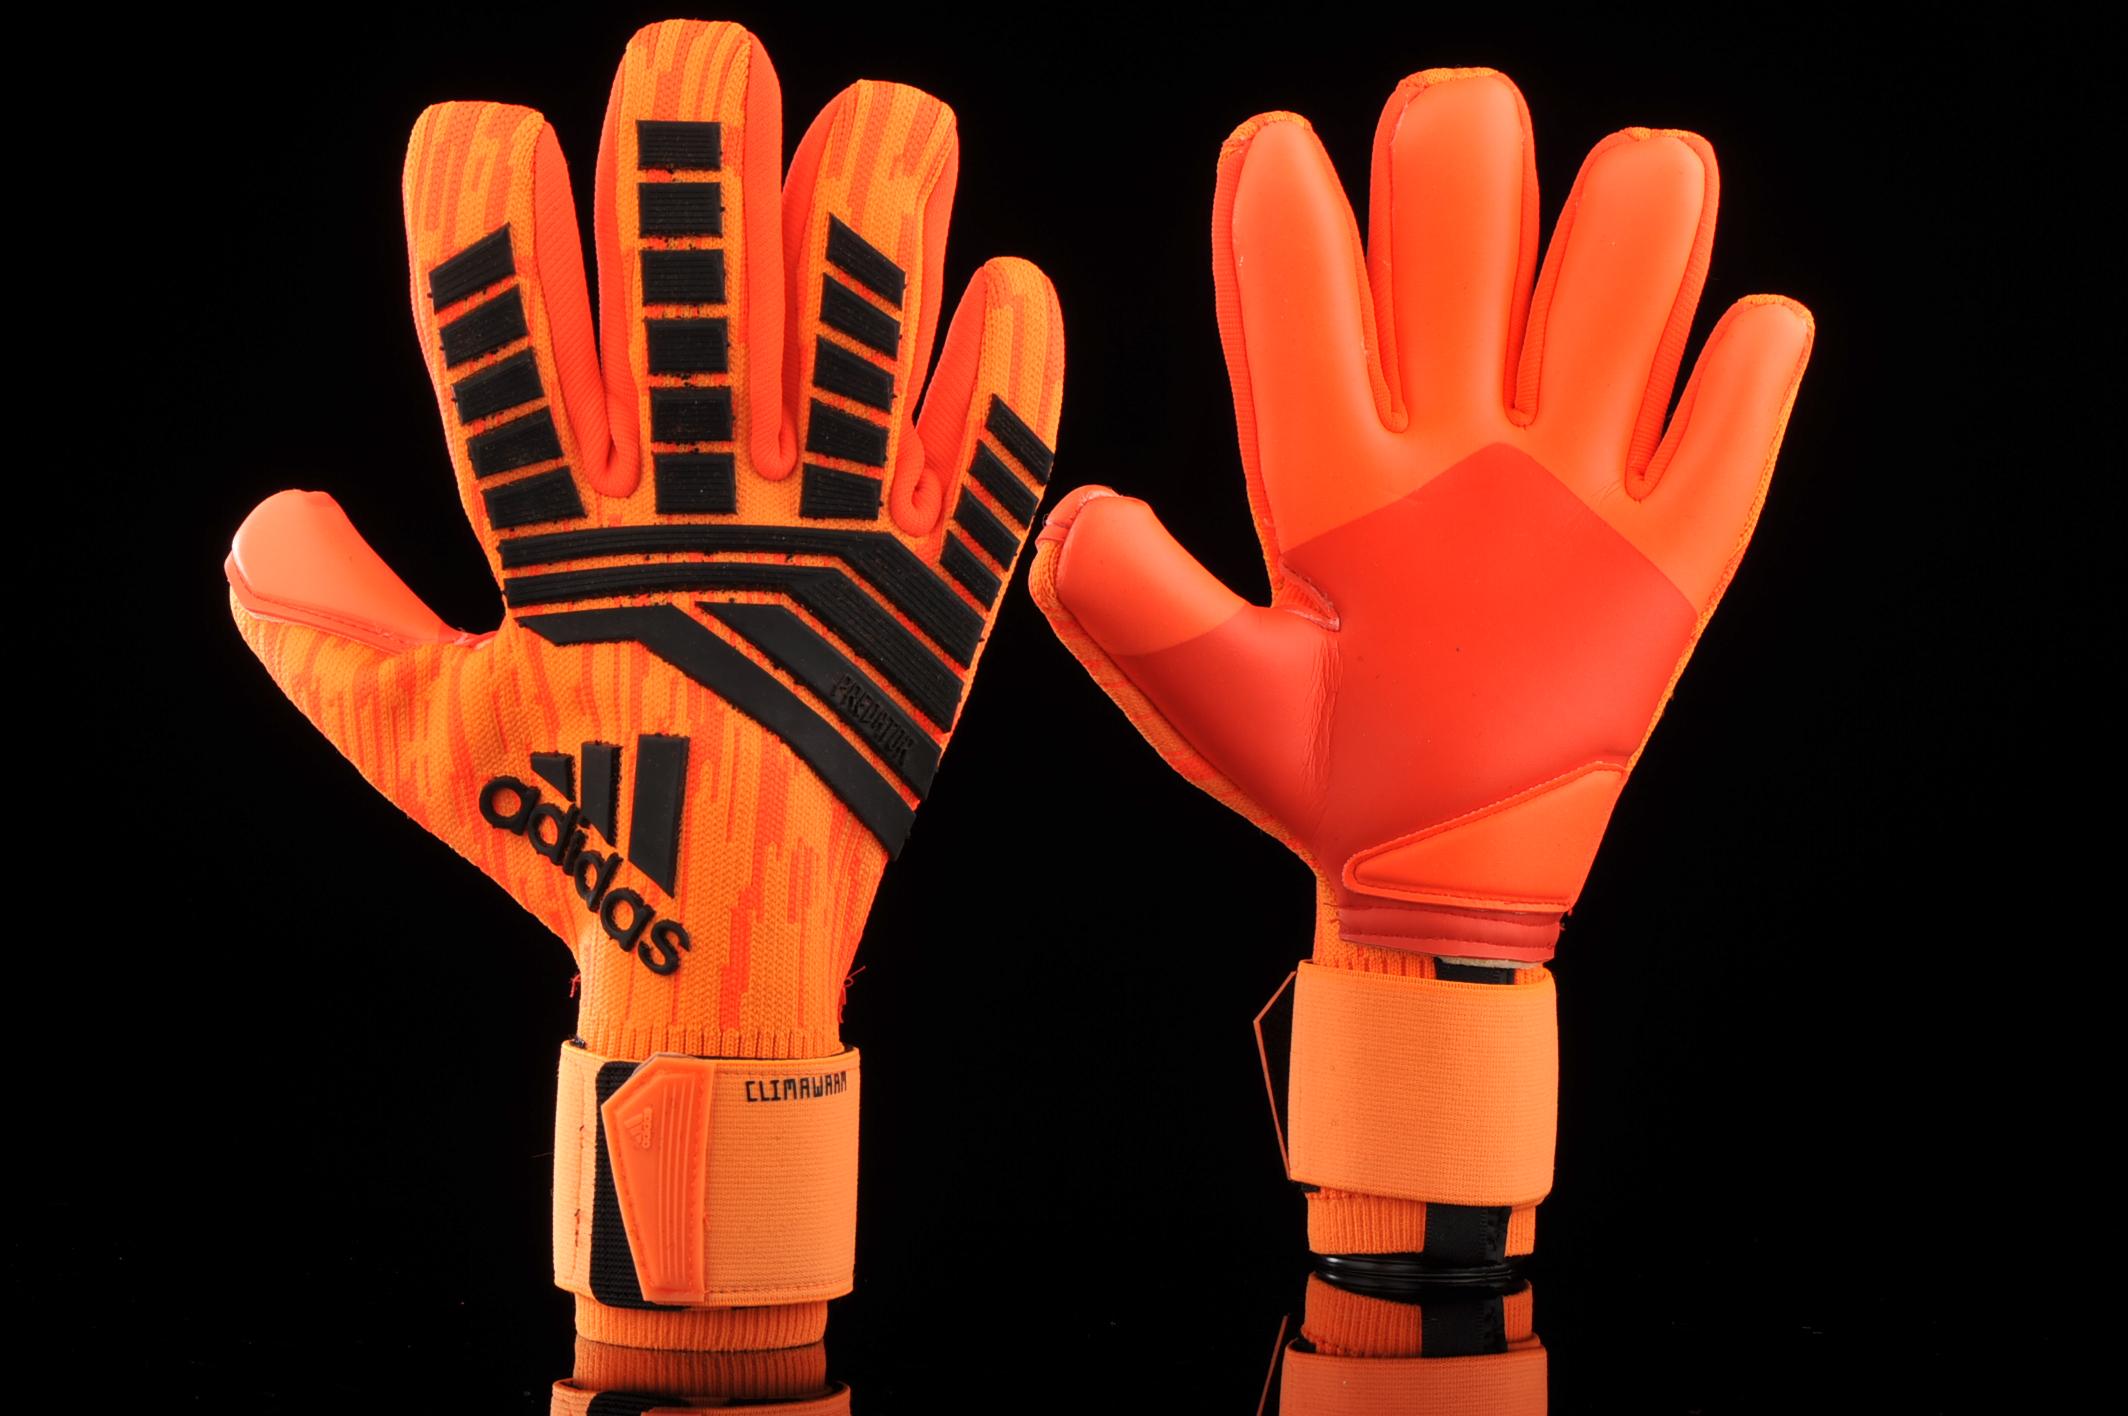 escotilla patrocinado actividad  Goalkeeper gloves adidas Climawarm CW5585 | R-GOL.com - Football boots &  equipment